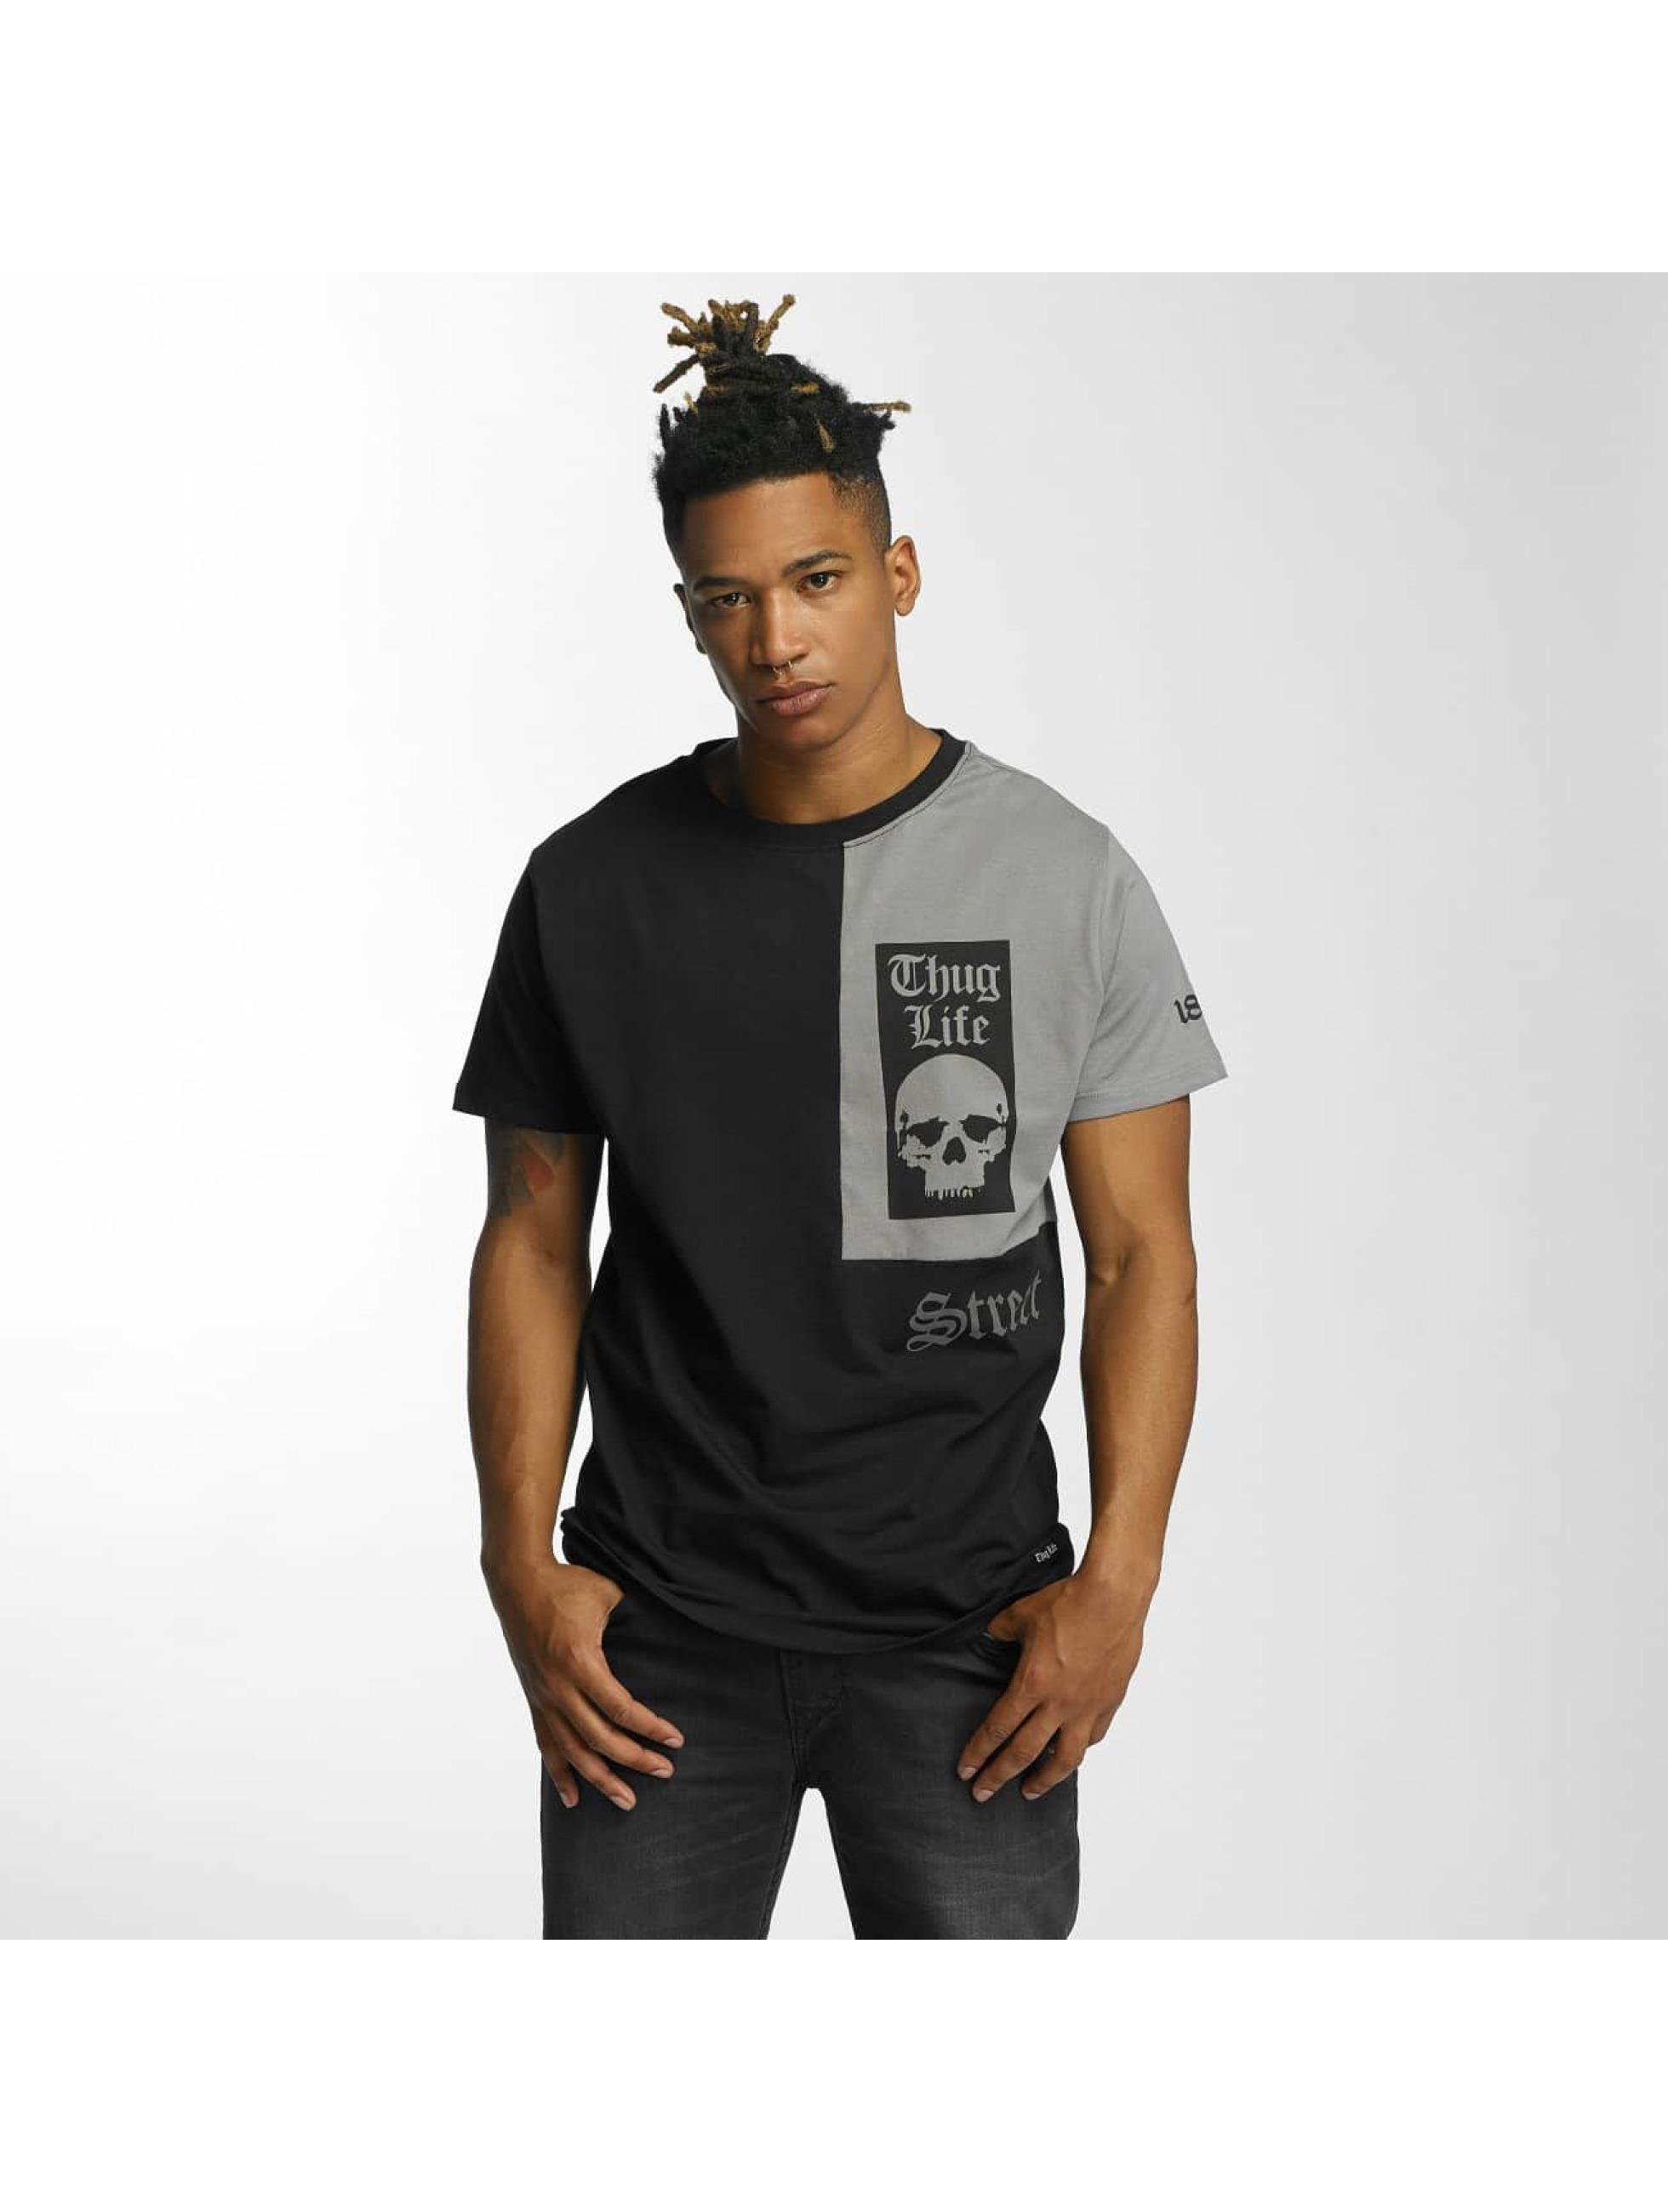 Thug Life / T-Shirt Qube in black 2XL